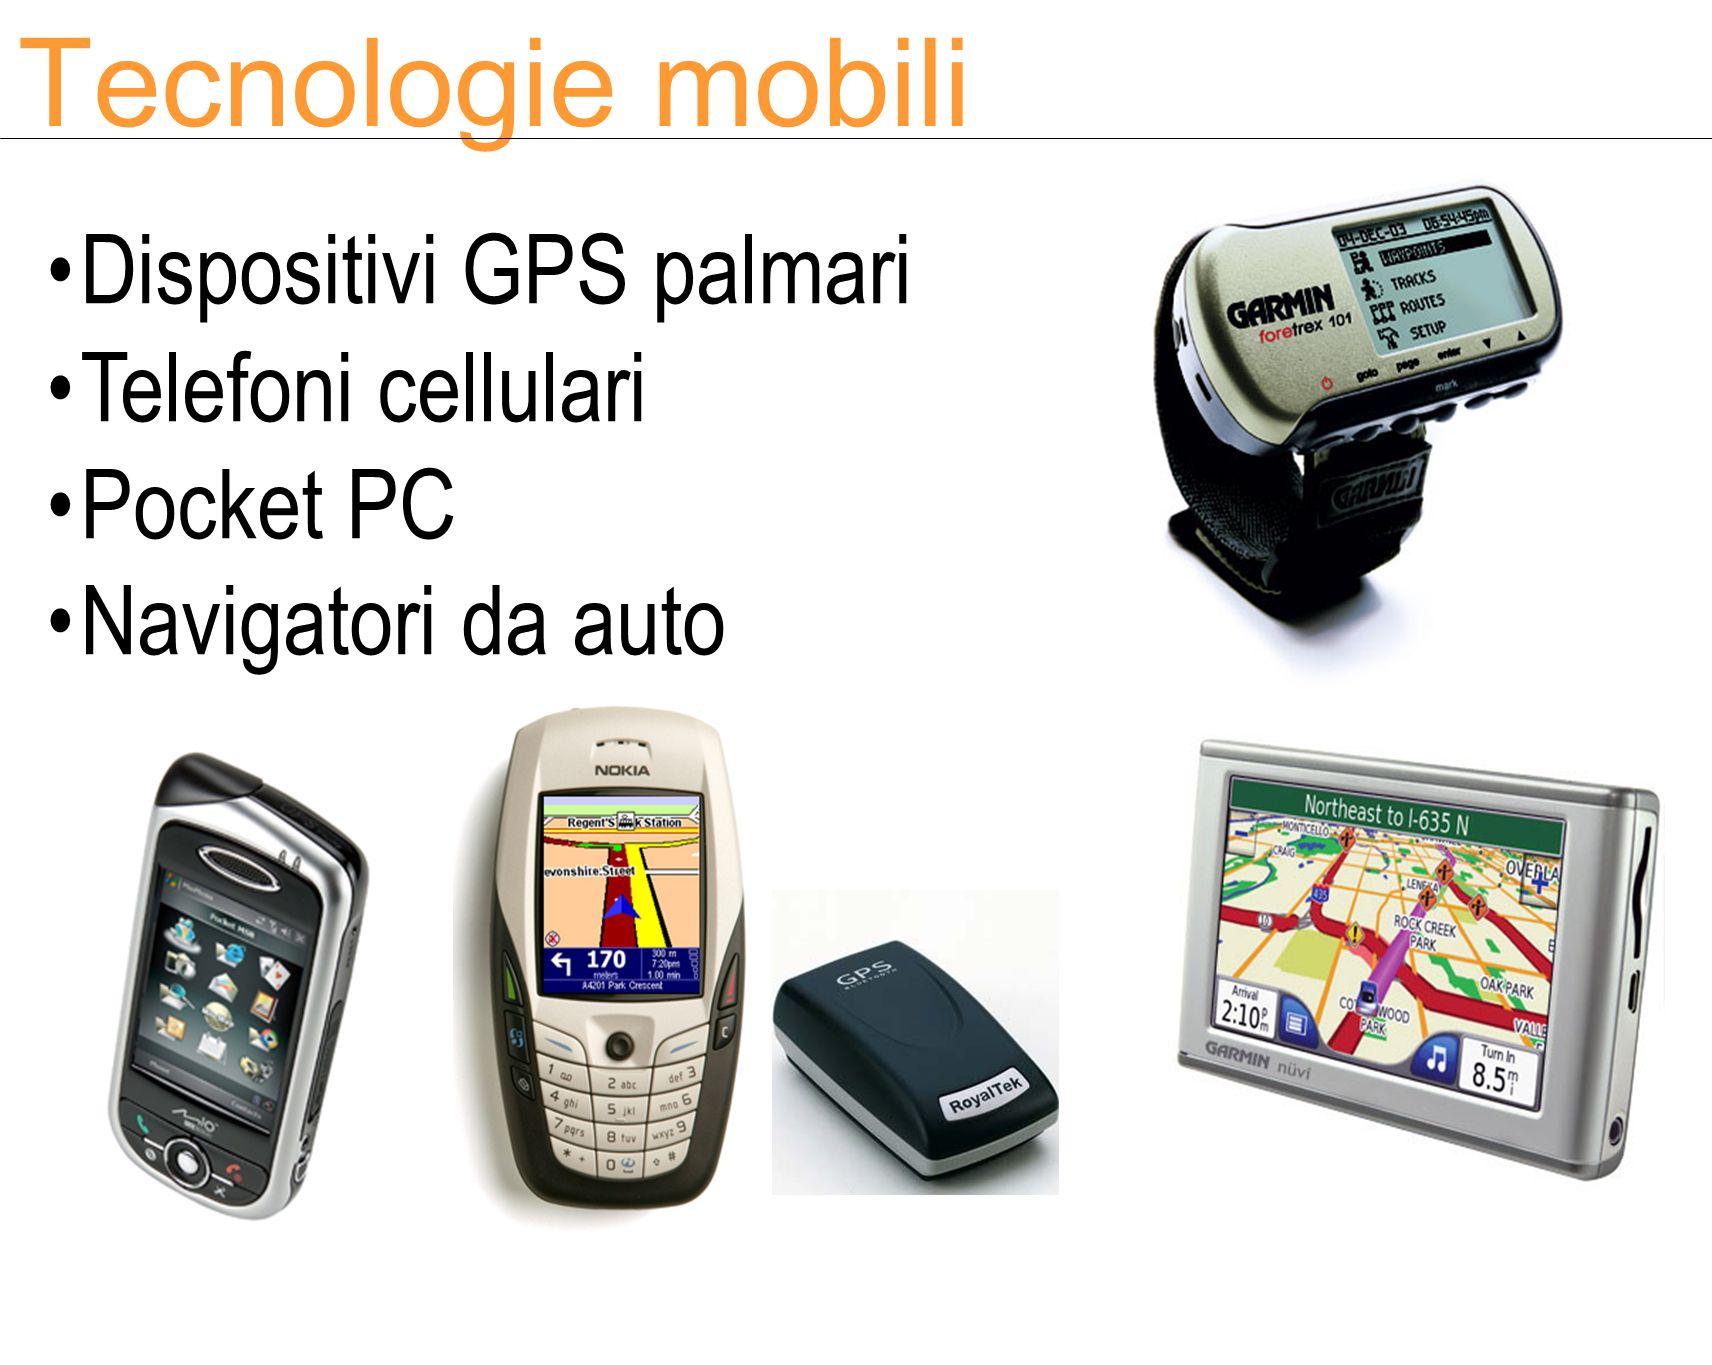 Tecnologie mobili Dispositivi GPS palmari Telefoni cellulari Pocket PC Navigatori da auto